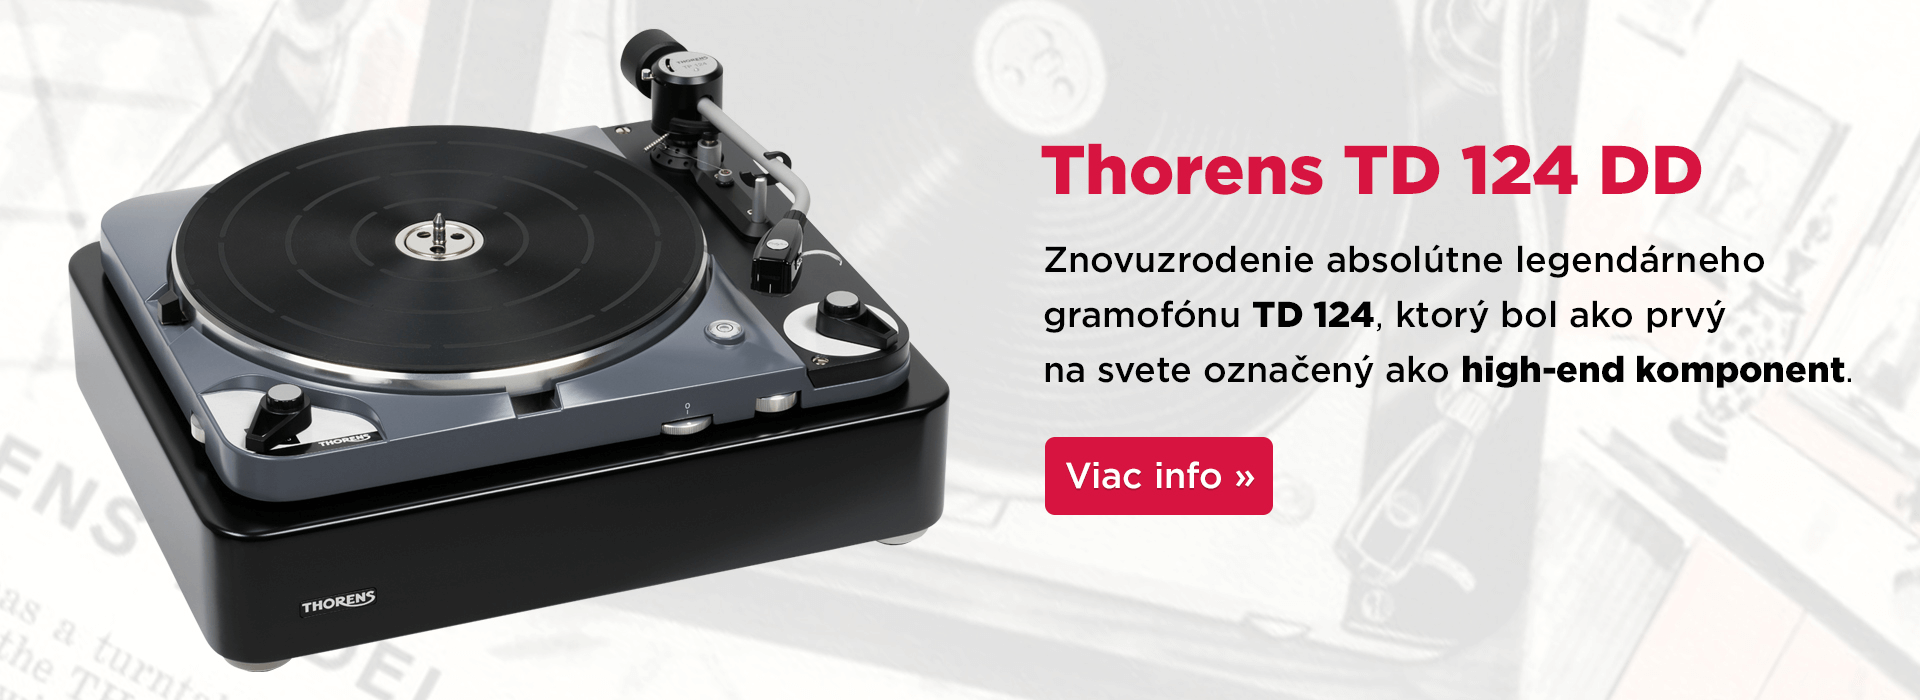 Gramofón Thorens TD 124 DD s priamym pohonom